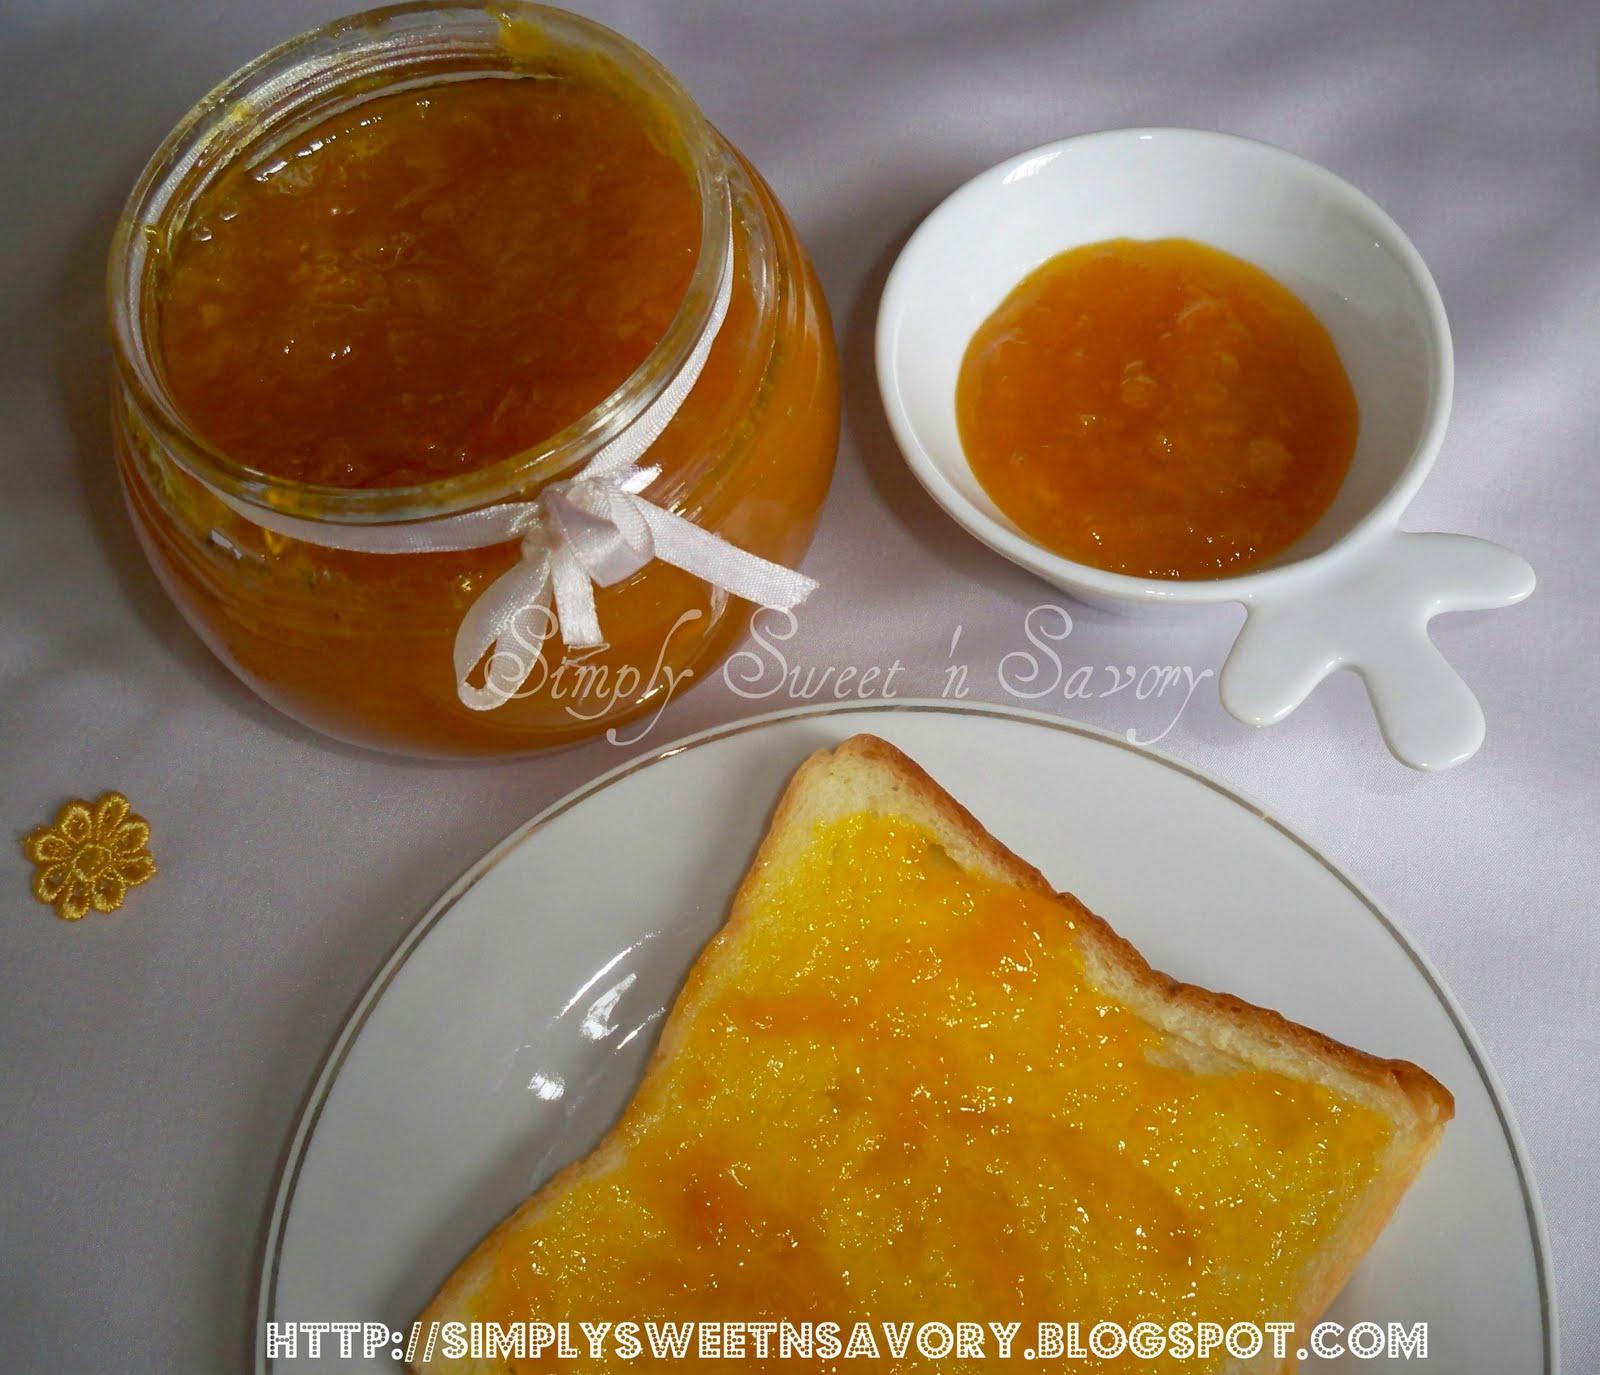 Simply Sweet 'n Savory: Mango Jam & A New Look